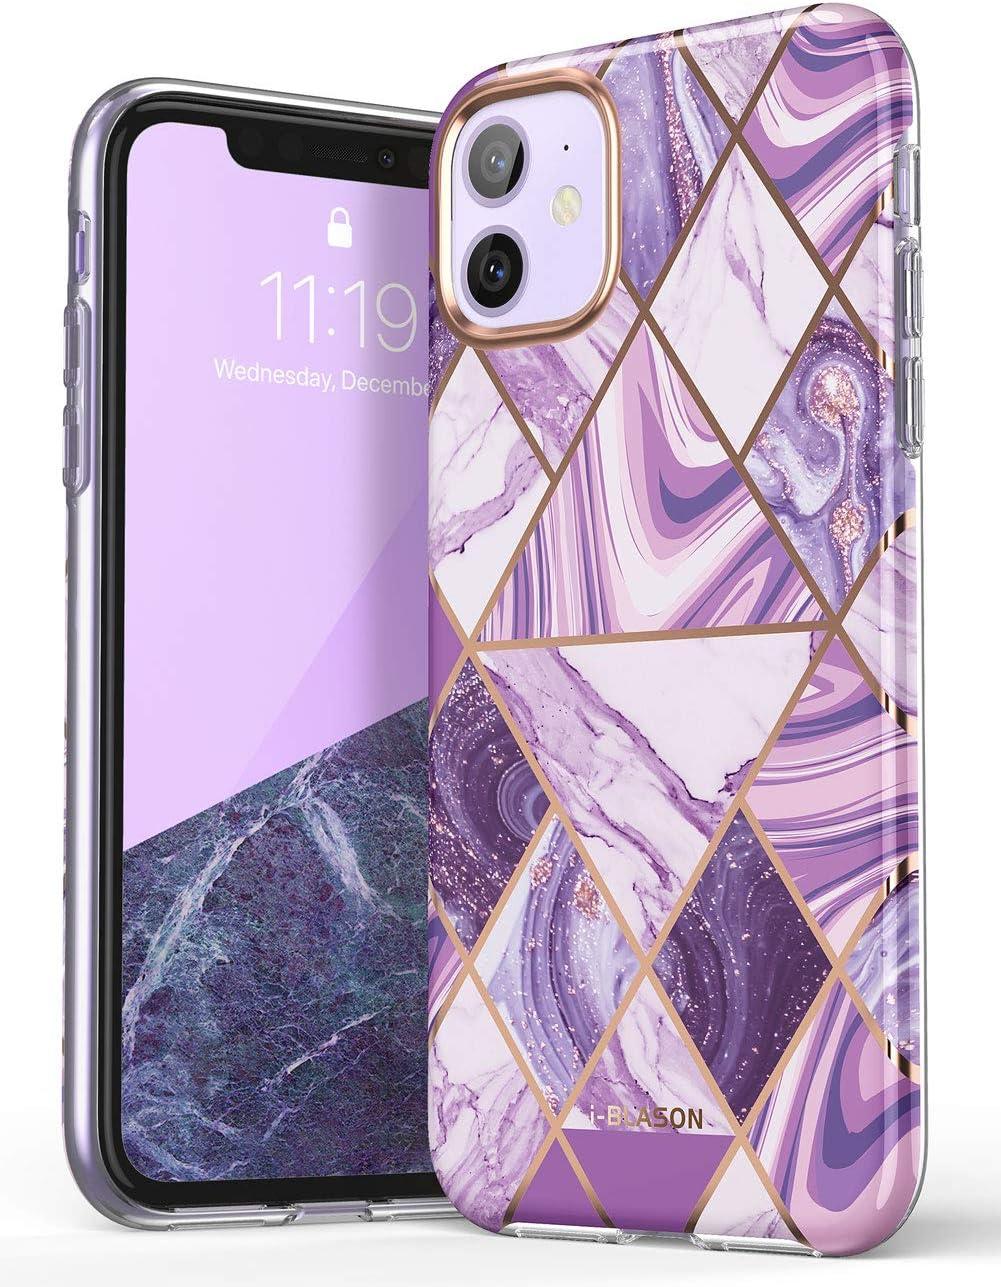 i-Blason Cosmo Lite Series Case for iPhone 11 (2019), Premium Hybrid Slim Protective Bumper Case with Camera Protection, Ameth, 6.1